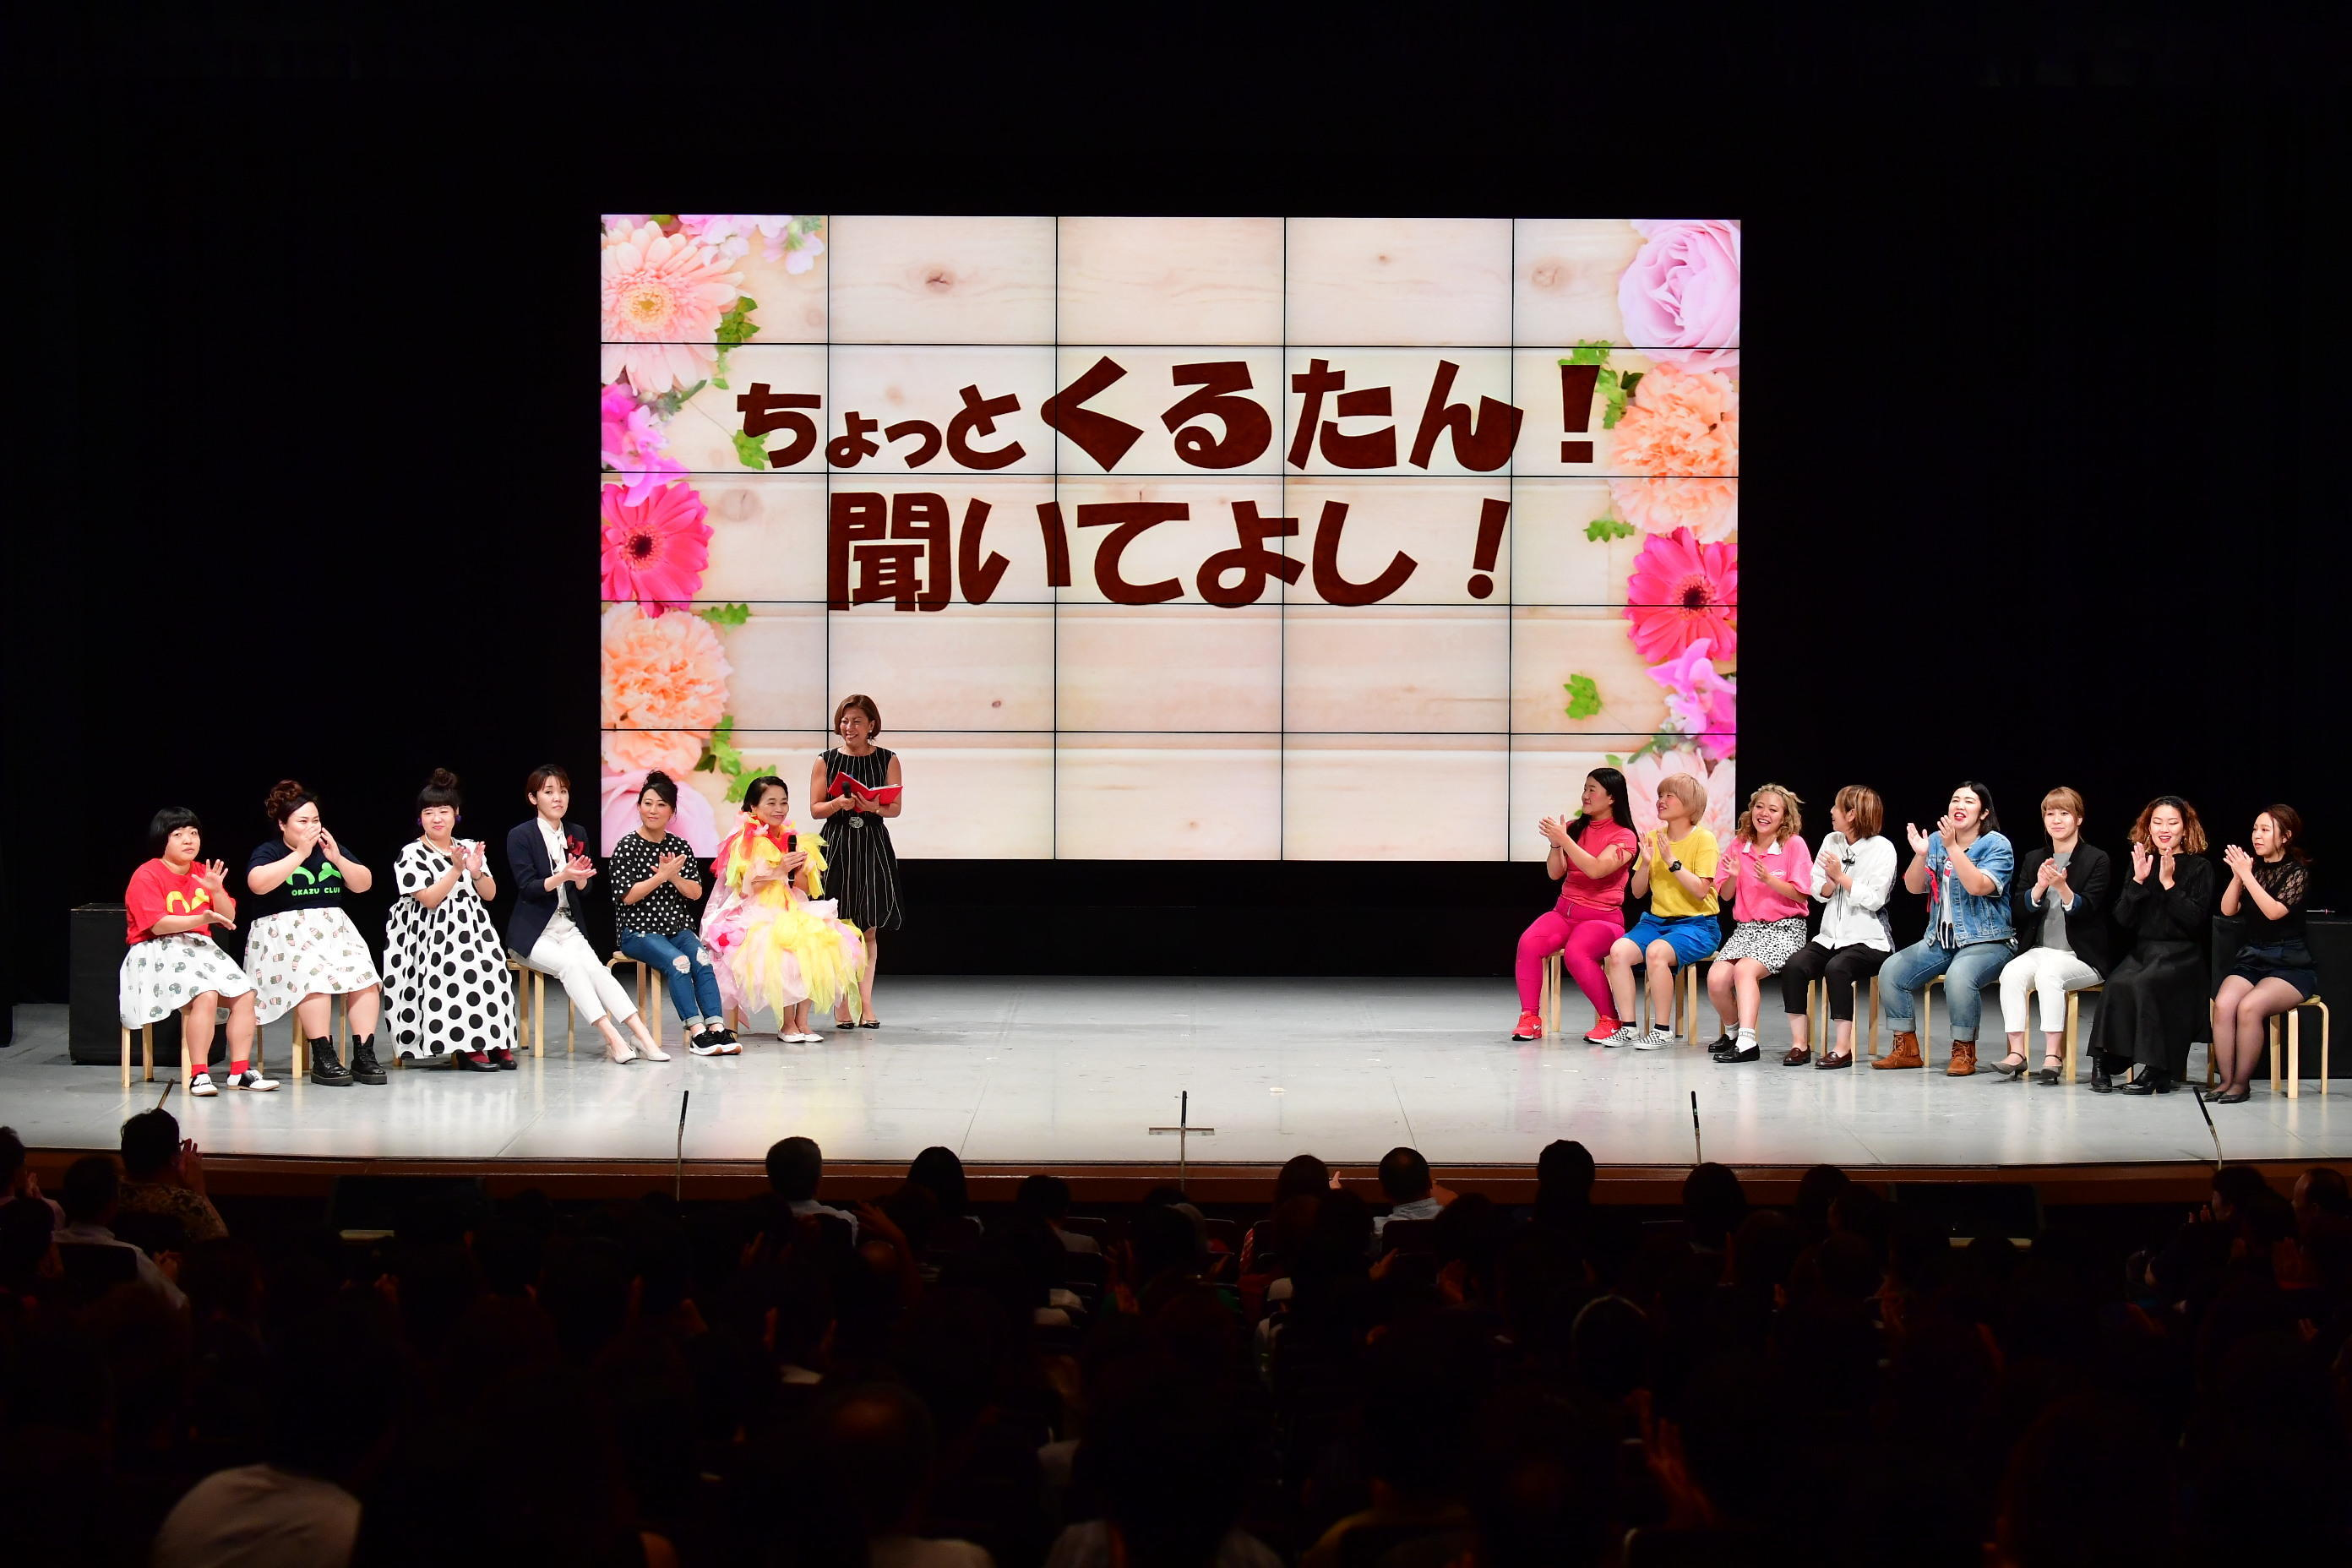 http://news.yoshimoto.co.jp/20180831235036-cf26b140cc0d31d1a37457a936fef8dbe5d8aba9.jpg